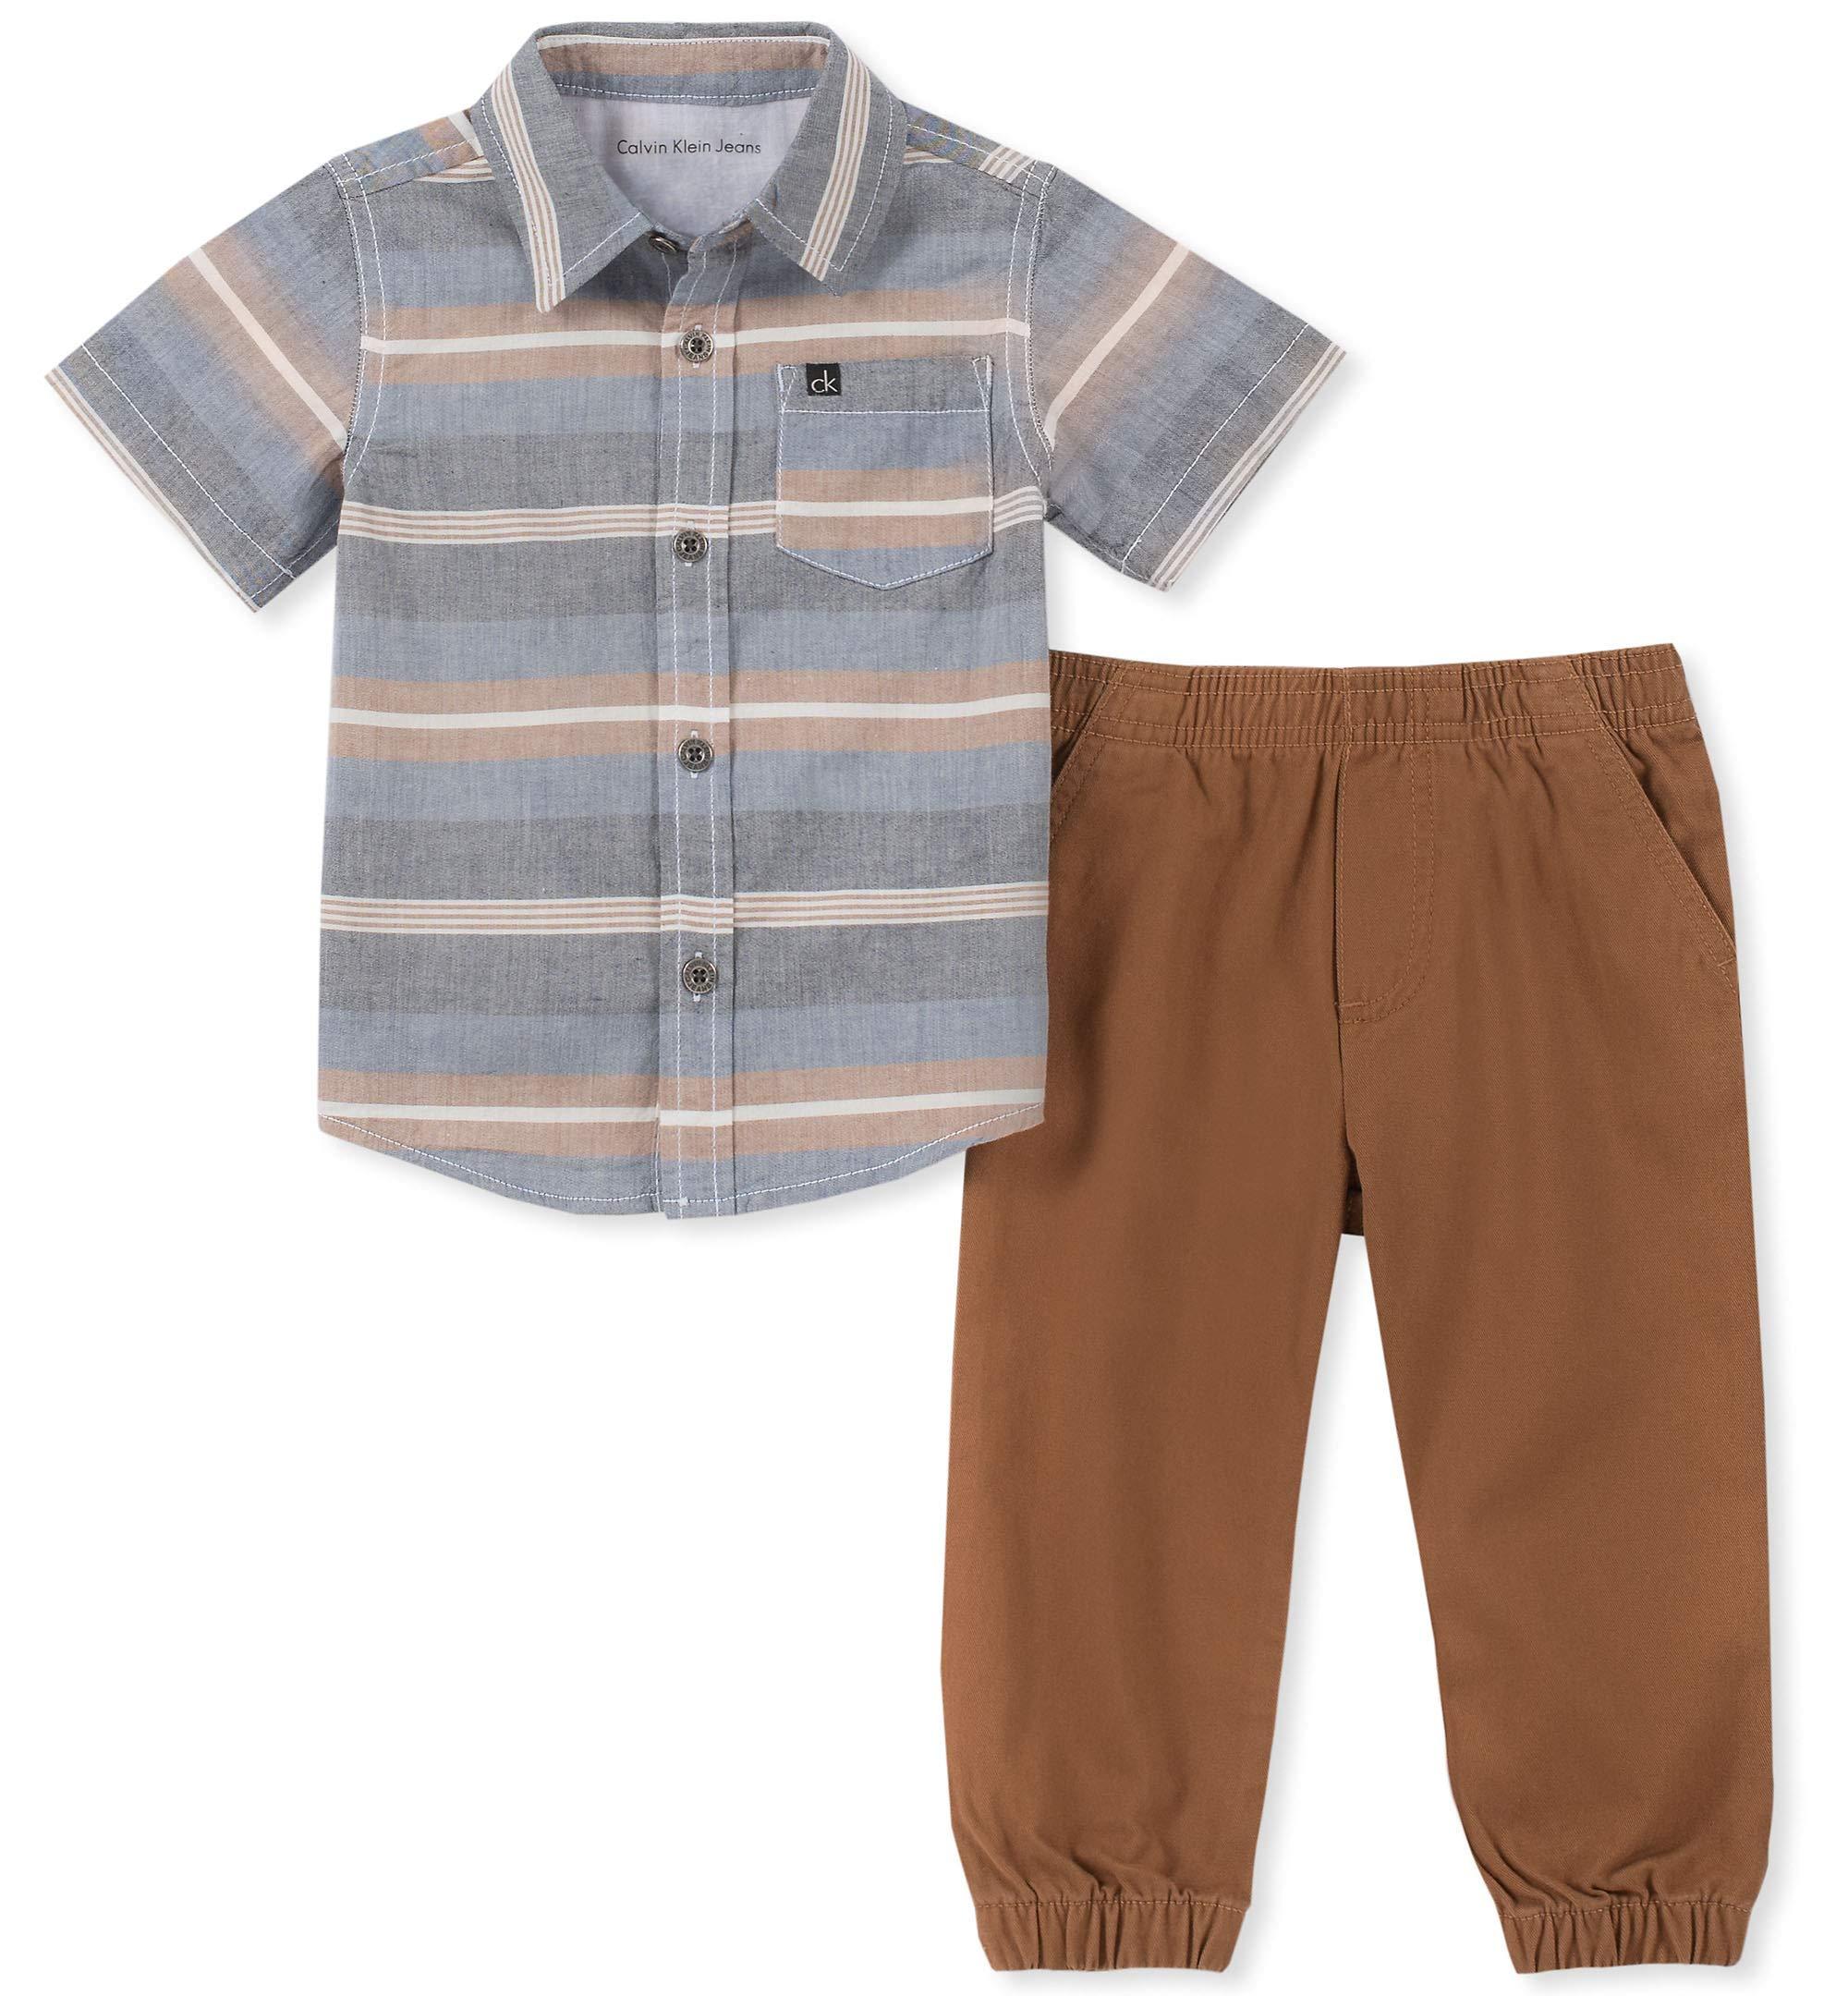 Calvin Klein Boys' Little 2 Pieces Shirt Pant Set-Short Sleeves, Gray/Khaki, 4